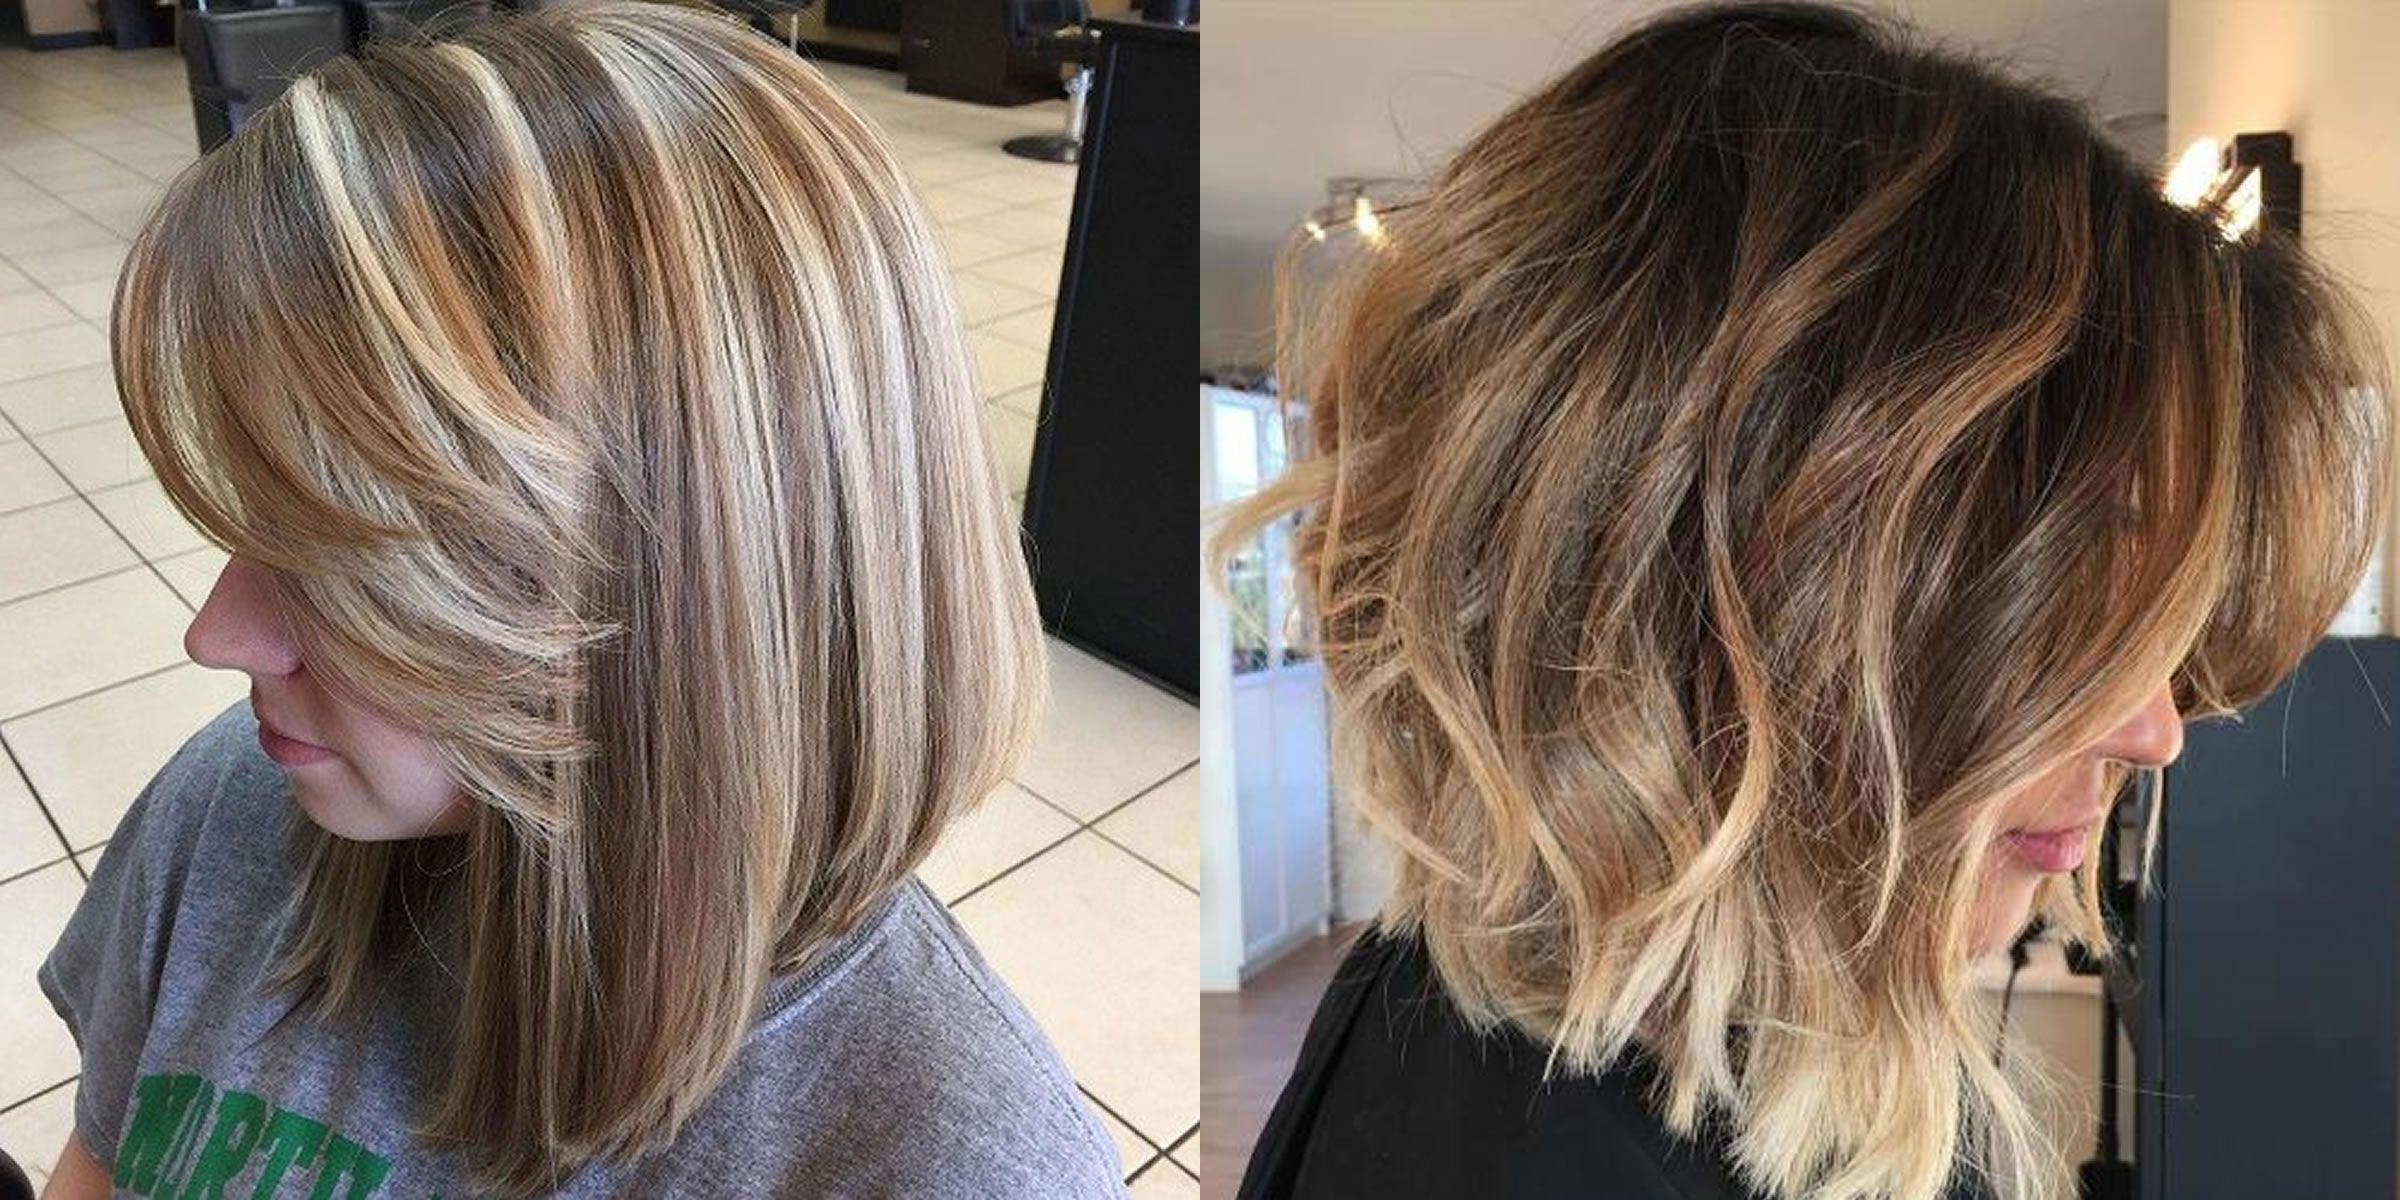 Frisuren 2020 Hochzeitsfrisuren Nageldesign 2020 Kurze Frisuren In 2020 Long Bob Haircuts Hairstyles Haircuts Hair Styles